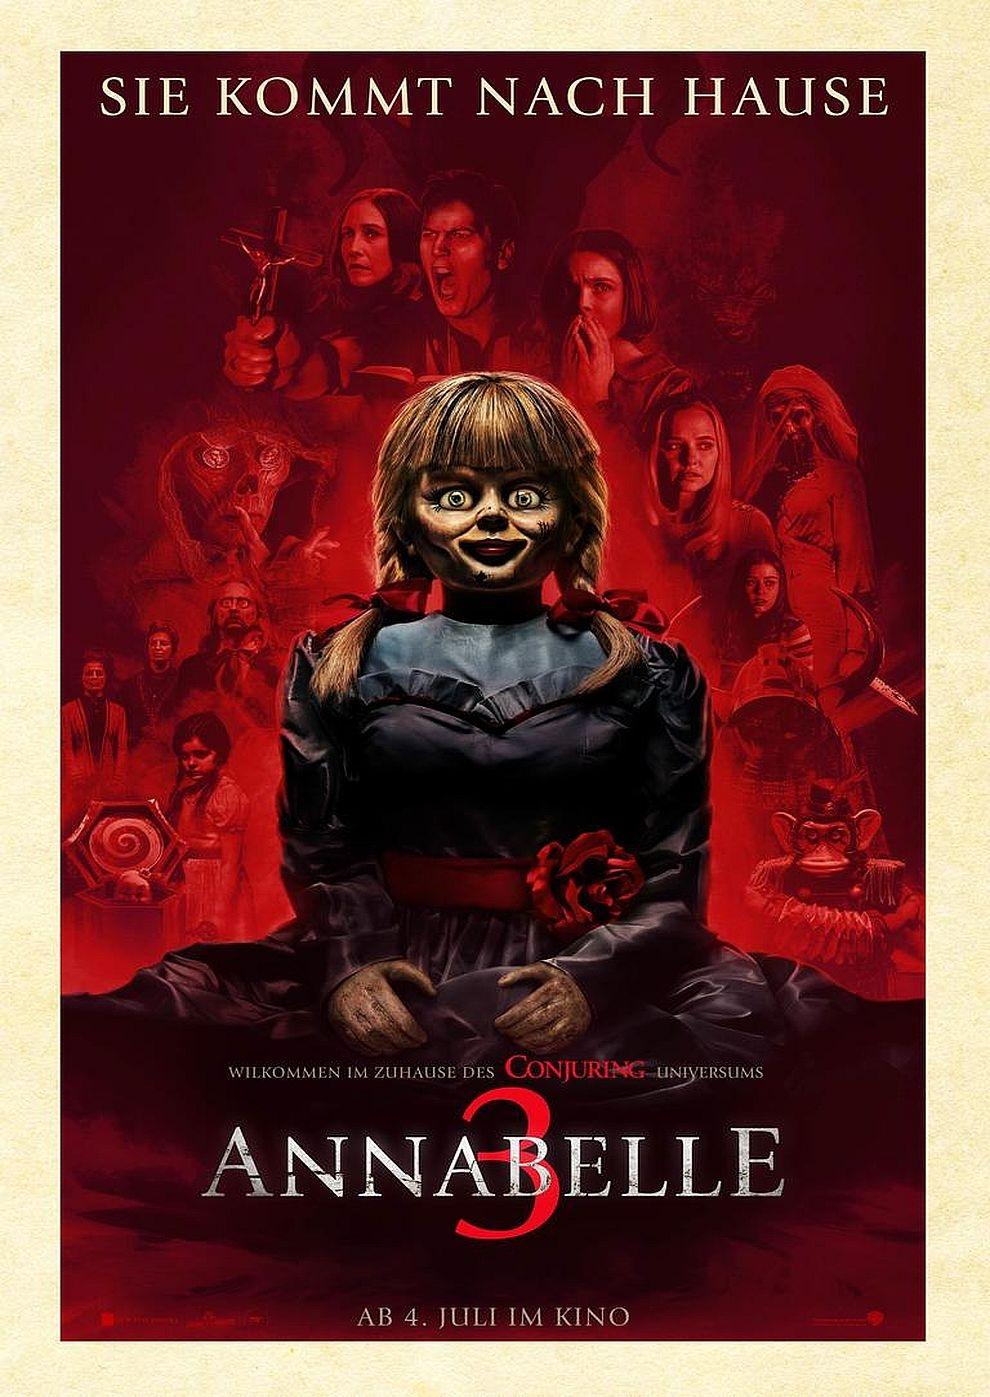 Annabelle 3 (Poster)